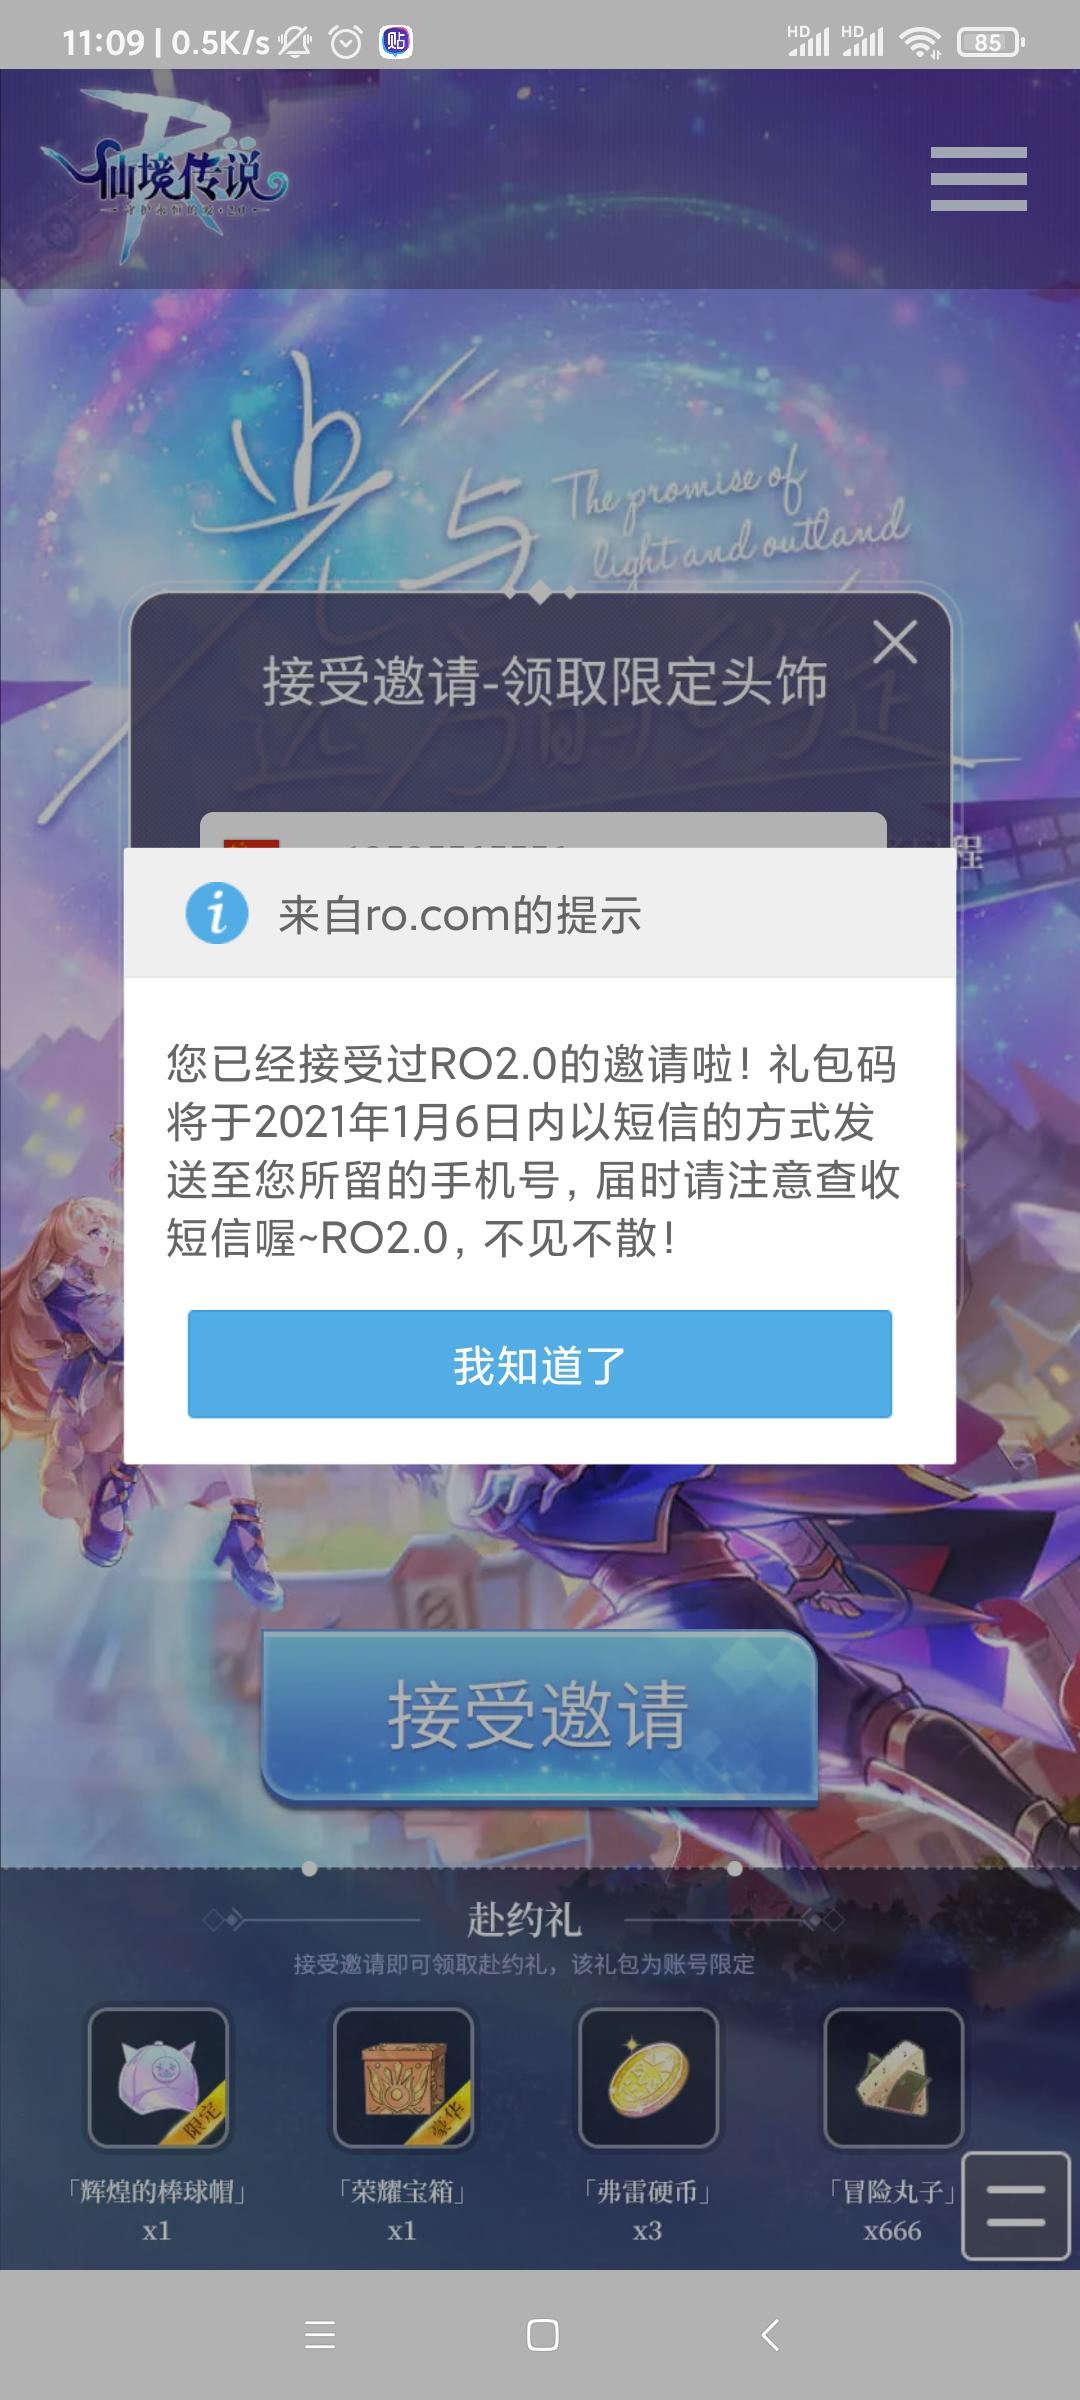 Screenshot_2020-12-24-11-09-16-592_com.UCMobile.jpg